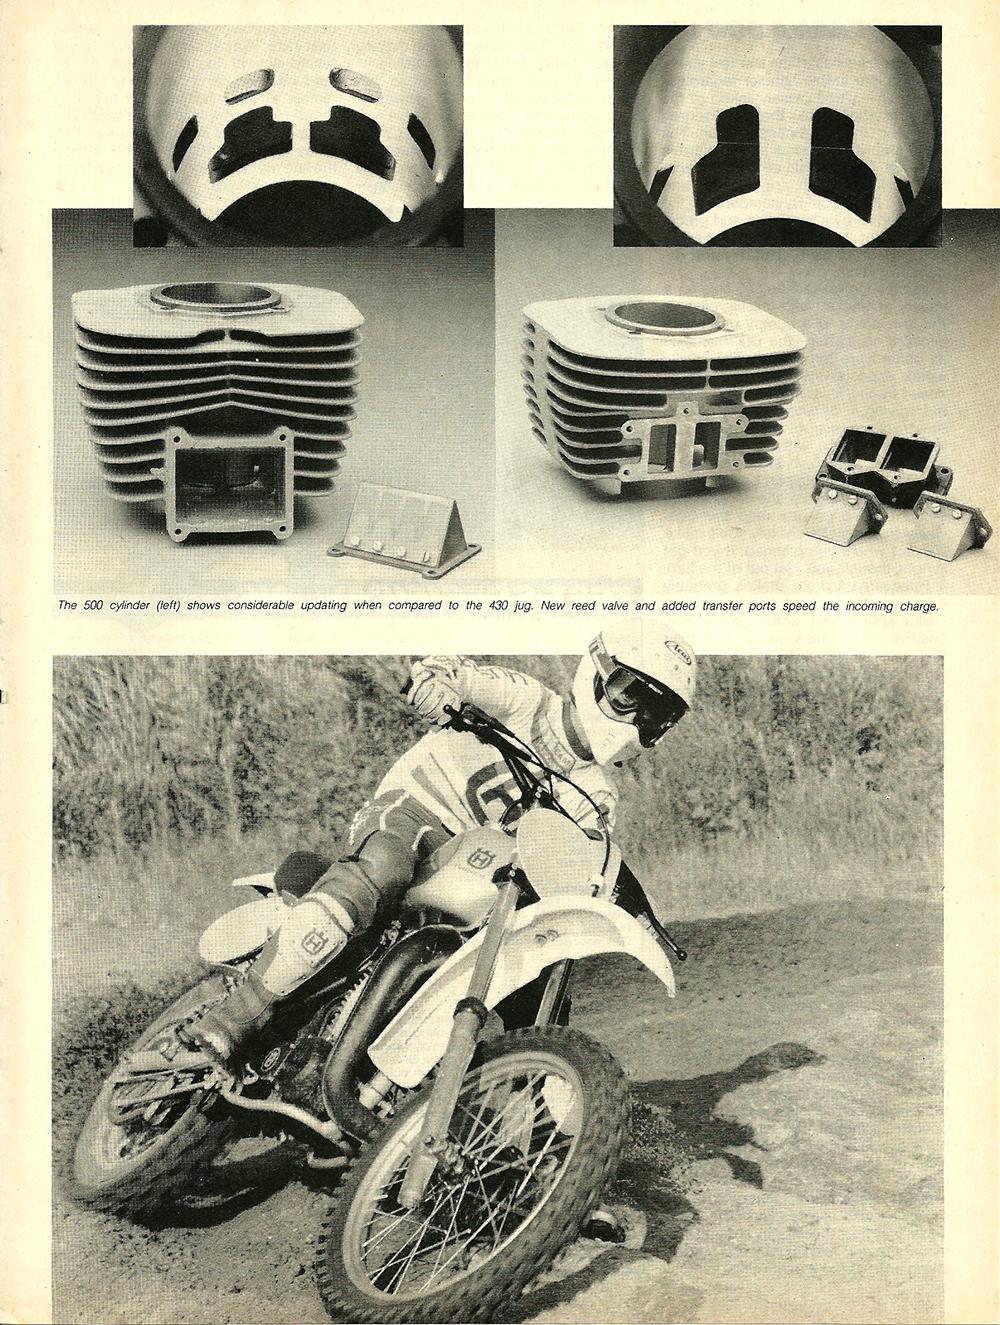 1983 Husqvarna 500 CR road test 6.jpg